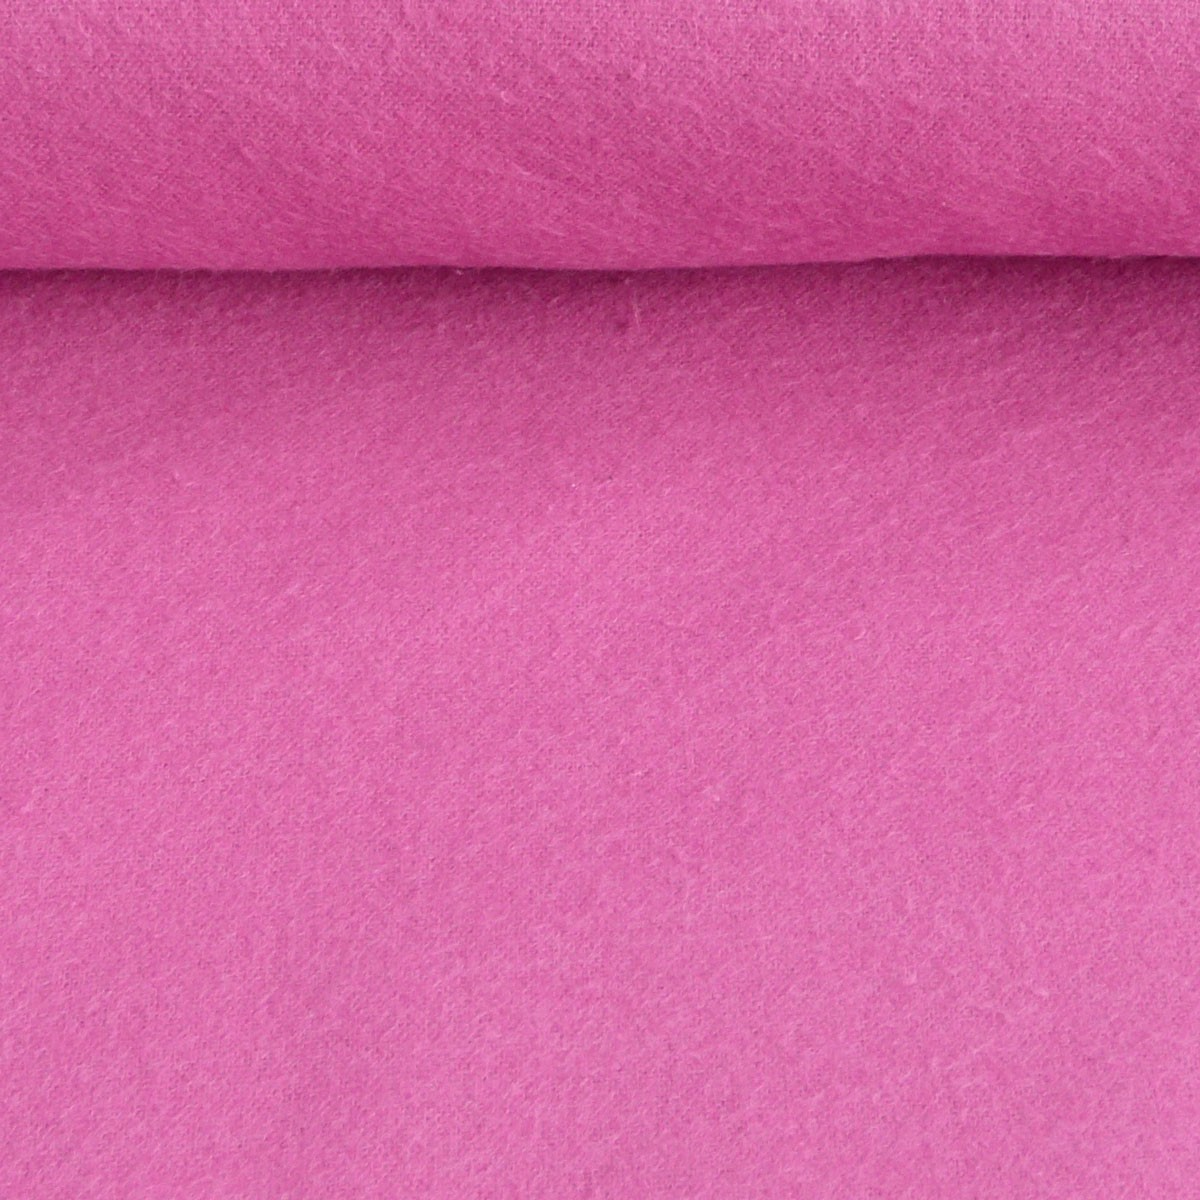 bekleidungsstoff flanell meterware uni pink stoffe stoffe uni baumwolle rein. Black Bedroom Furniture Sets. Home Design Ideas